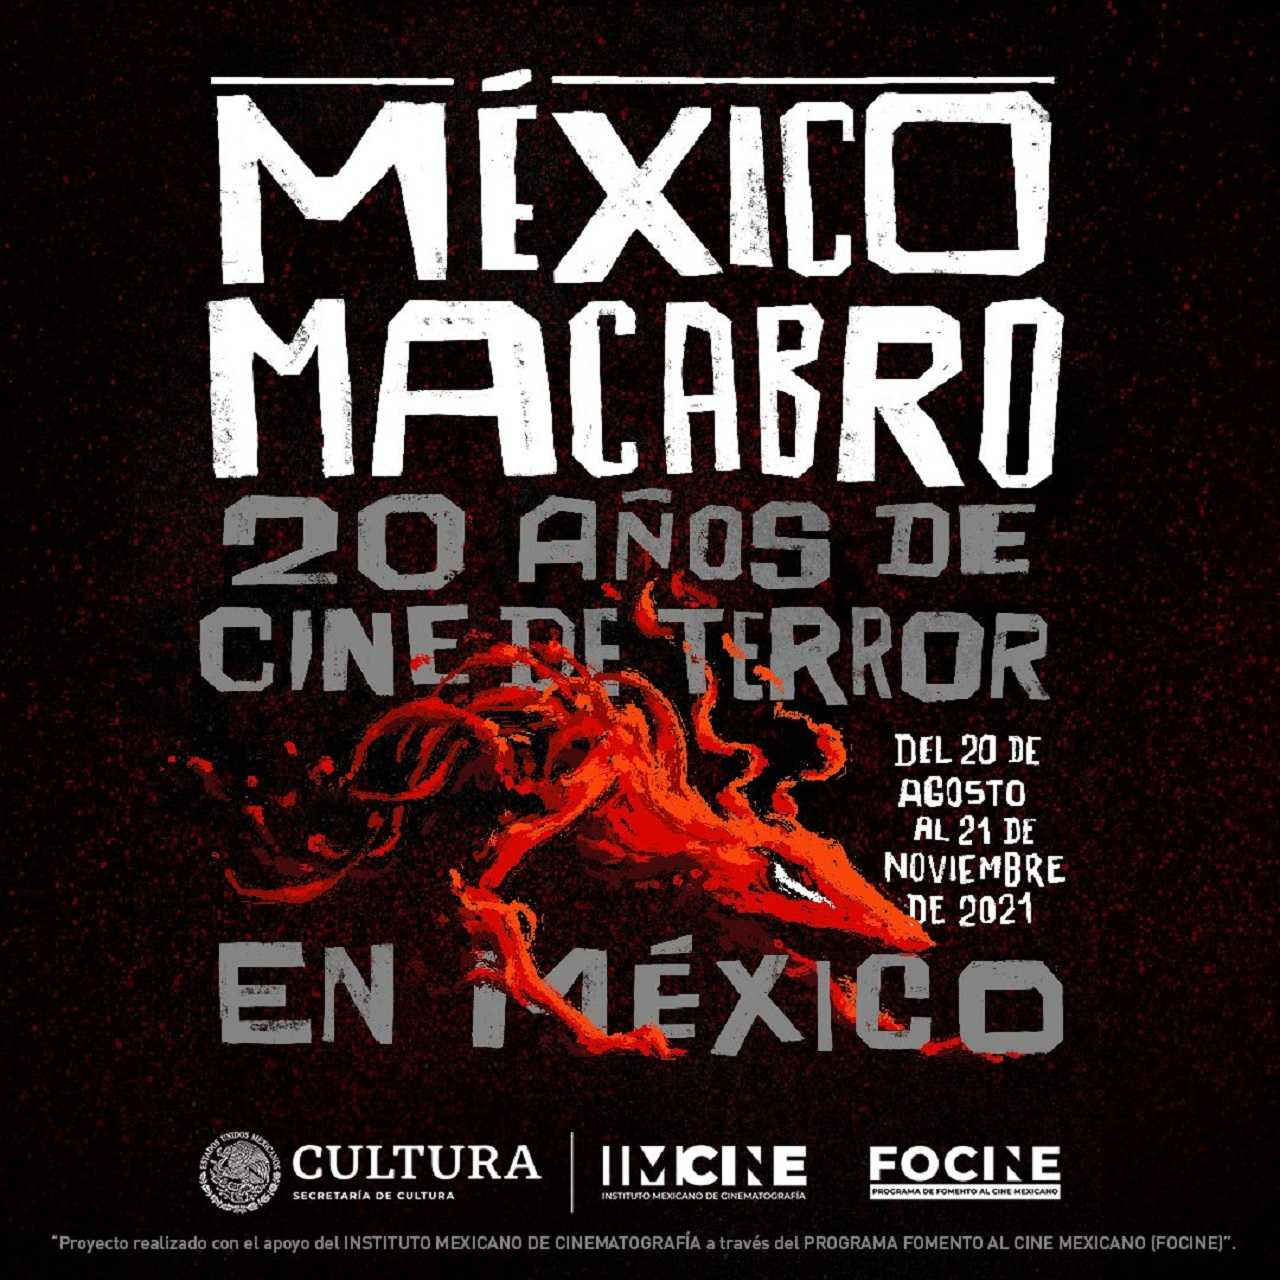 Festival Macabro Cineteca Programación